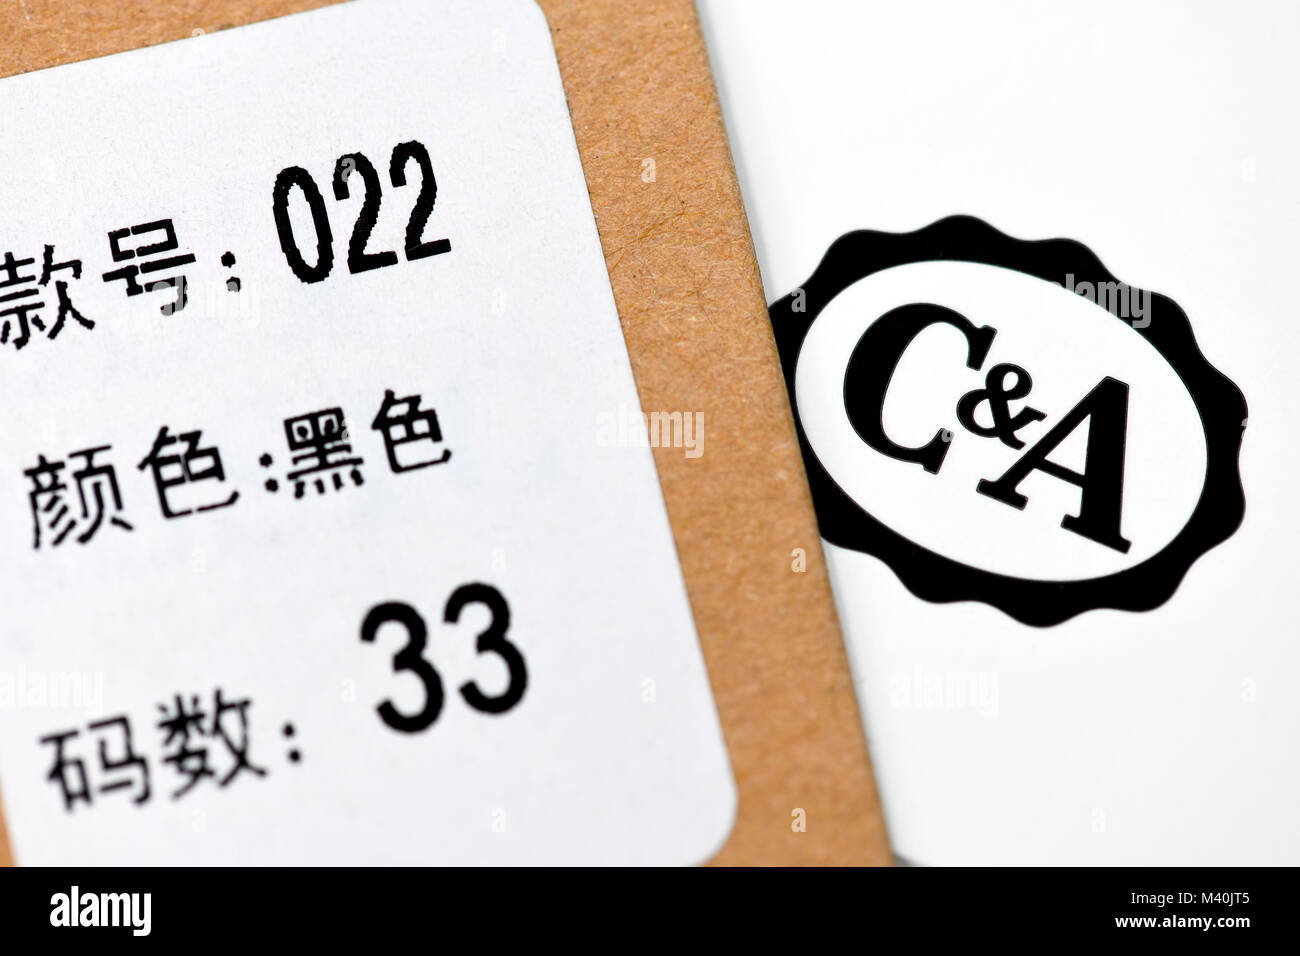 C A La Tradicion Y La Etiqueta Del Logotipo De La Compania China C A Comprueba La Venta De La Empresa A China C Un Logotipo Und Chinesisches Traditionsunternehmen Etikett C Fotografia De Stock